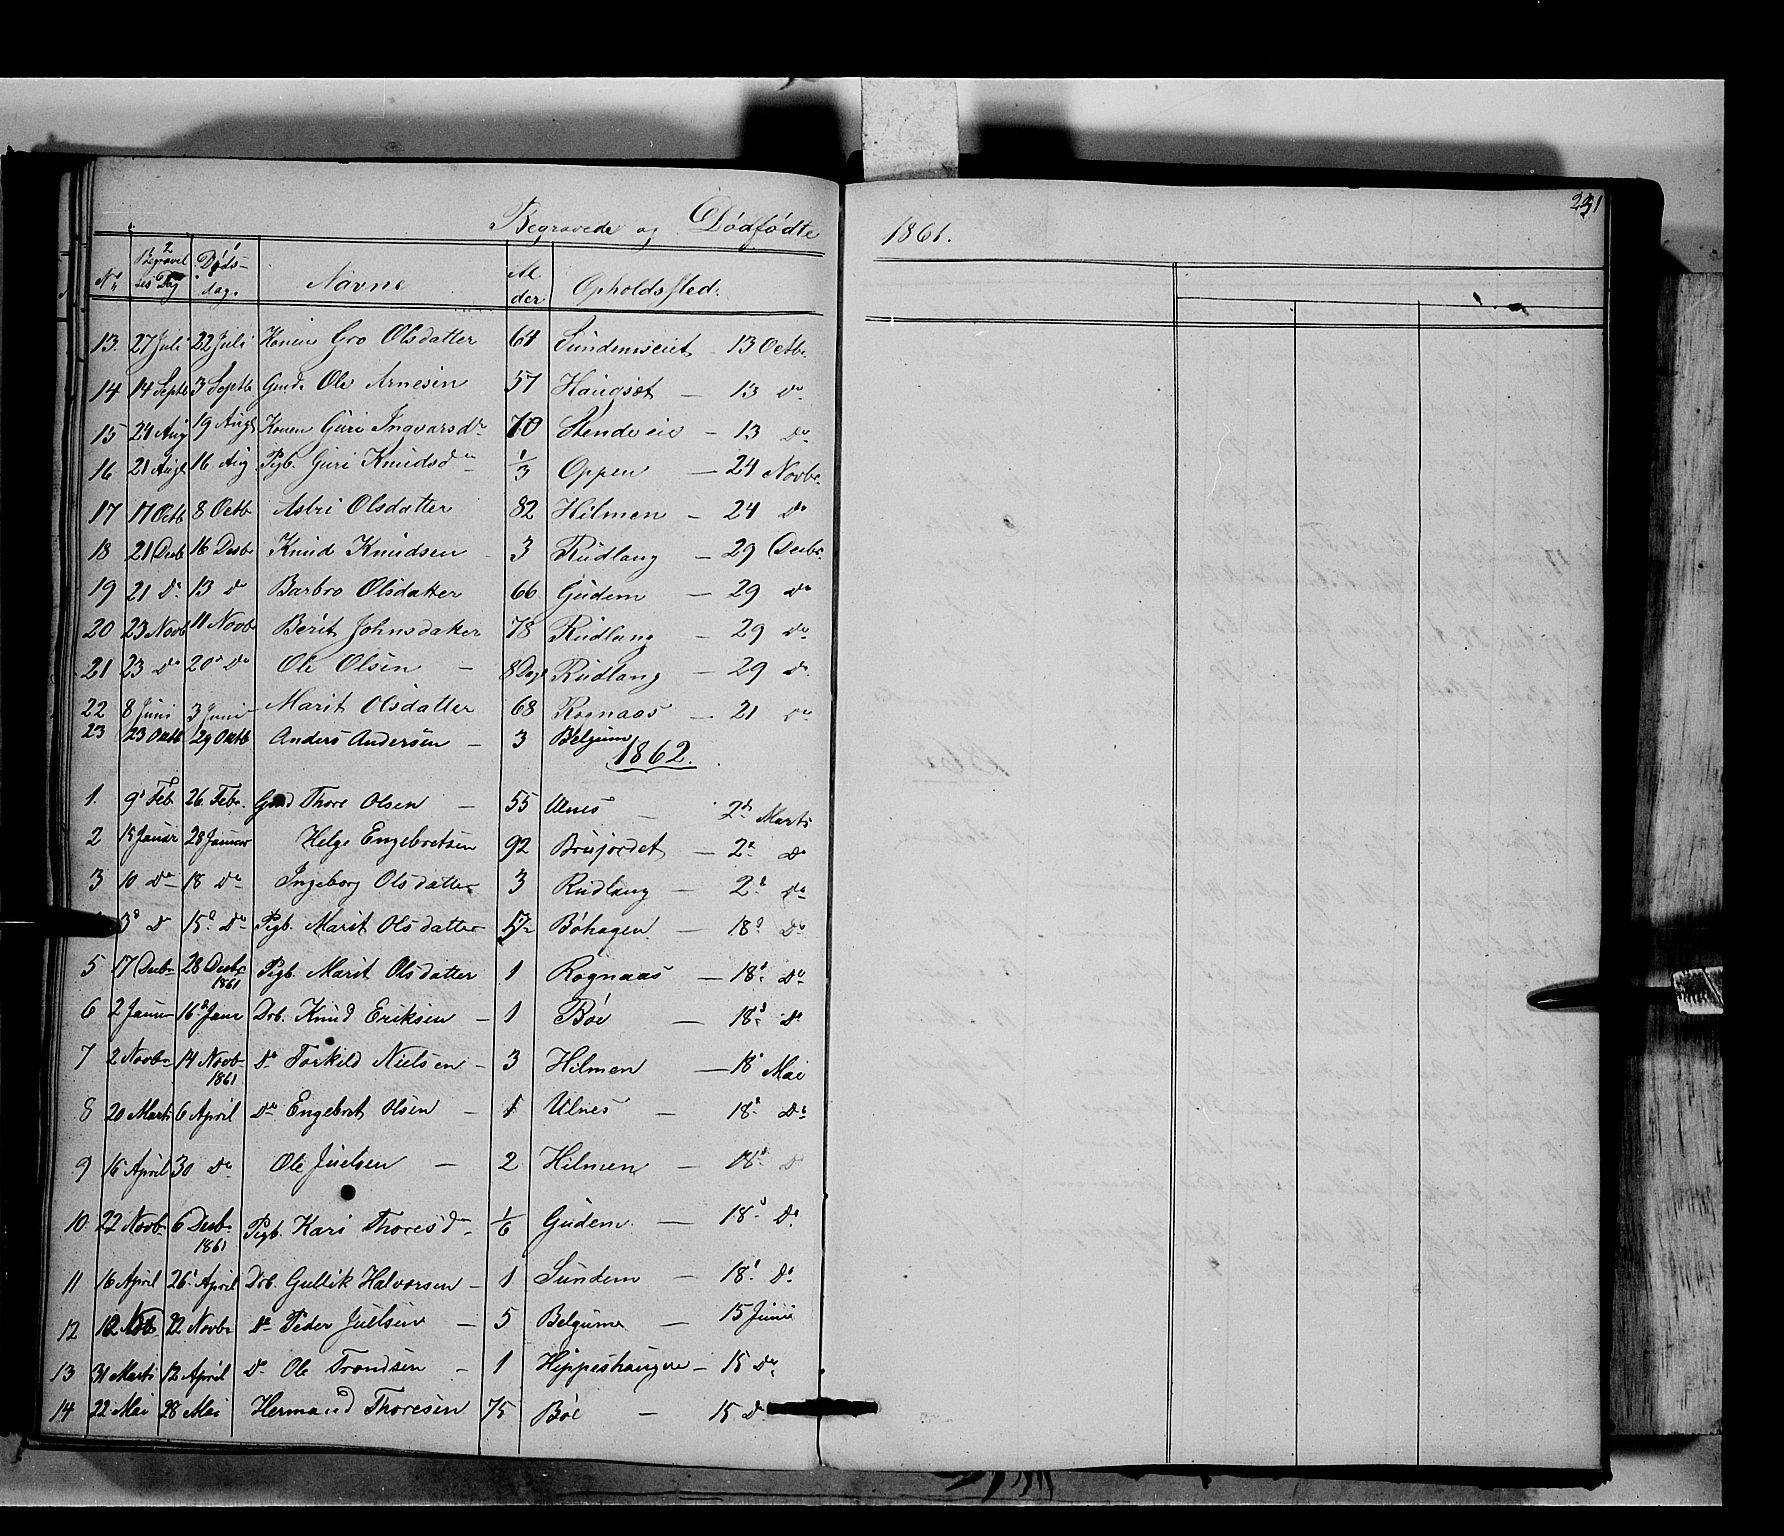 SAH, Nord-Aurdal prestekontor, Ministerialbok nr. 6, 1842-1863, s. 231